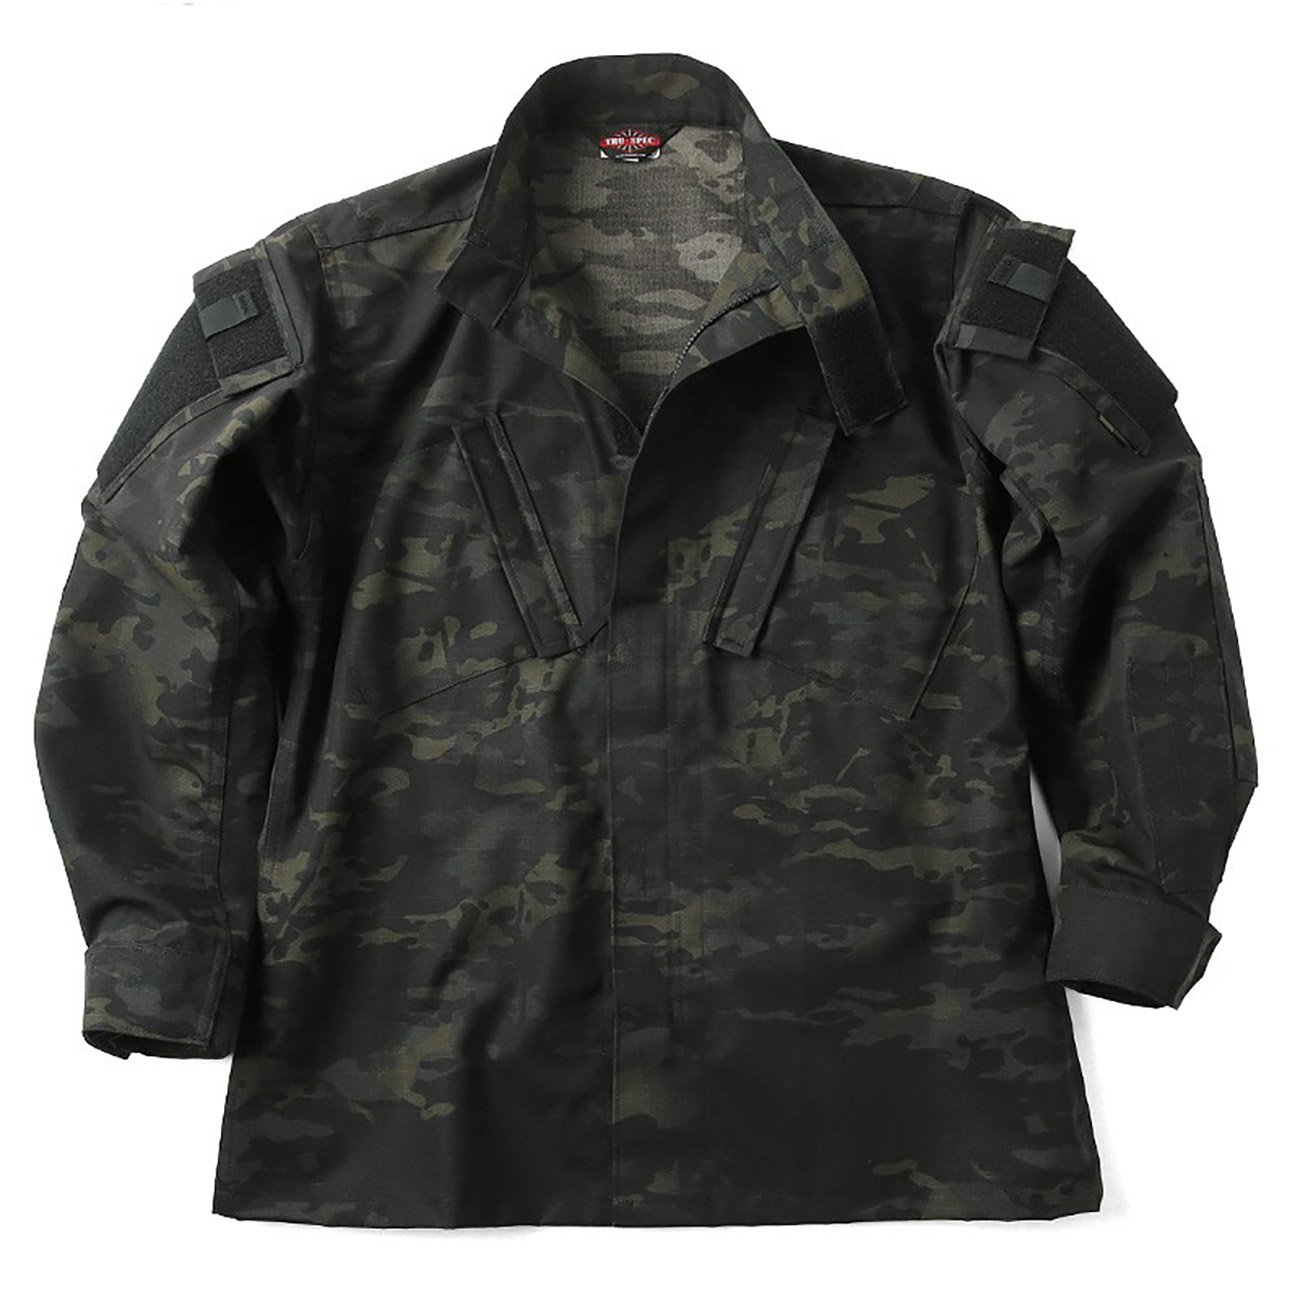 TRU-SPEC Tactical Response Uniform ジャケット(シャツ) MULTICAM FAMILY B07C9Z53MY M-R|1229 MultiCam Black 1229 MultiCam Black M-R